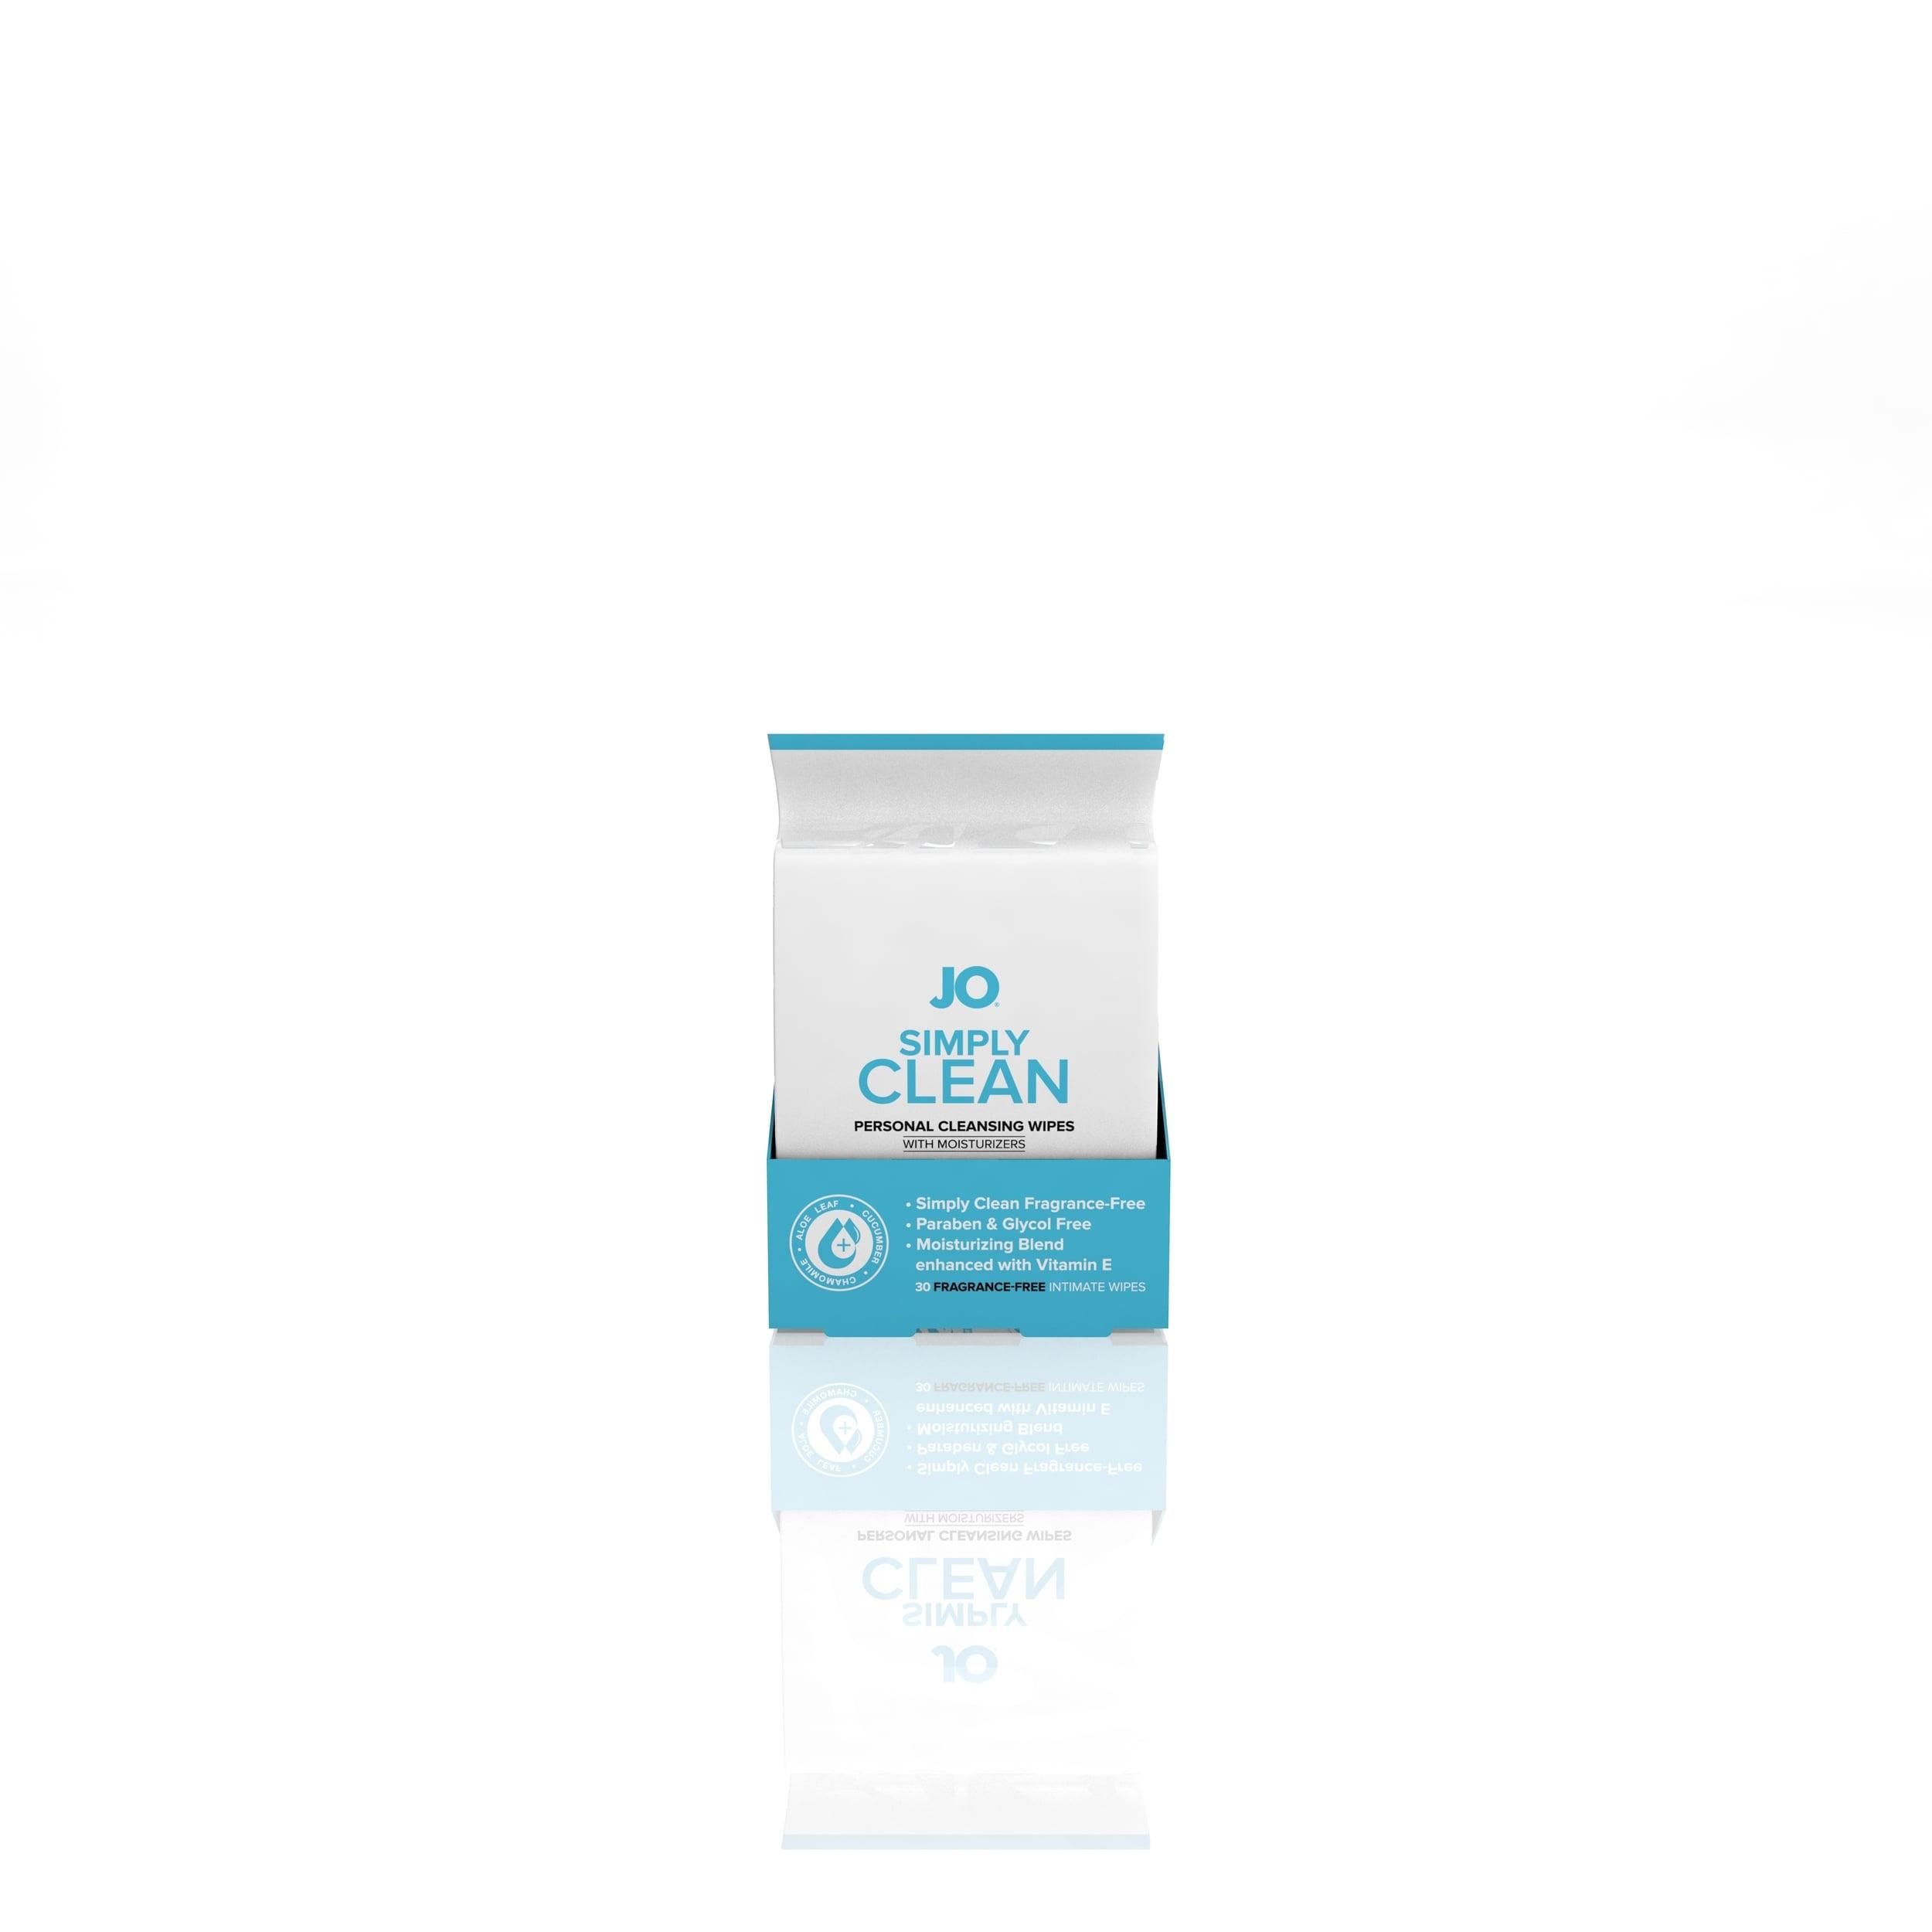 30564 - JO PERSONAL CLEANSING WIPES - SIMPLY CLEAN - 30 pack.jpg